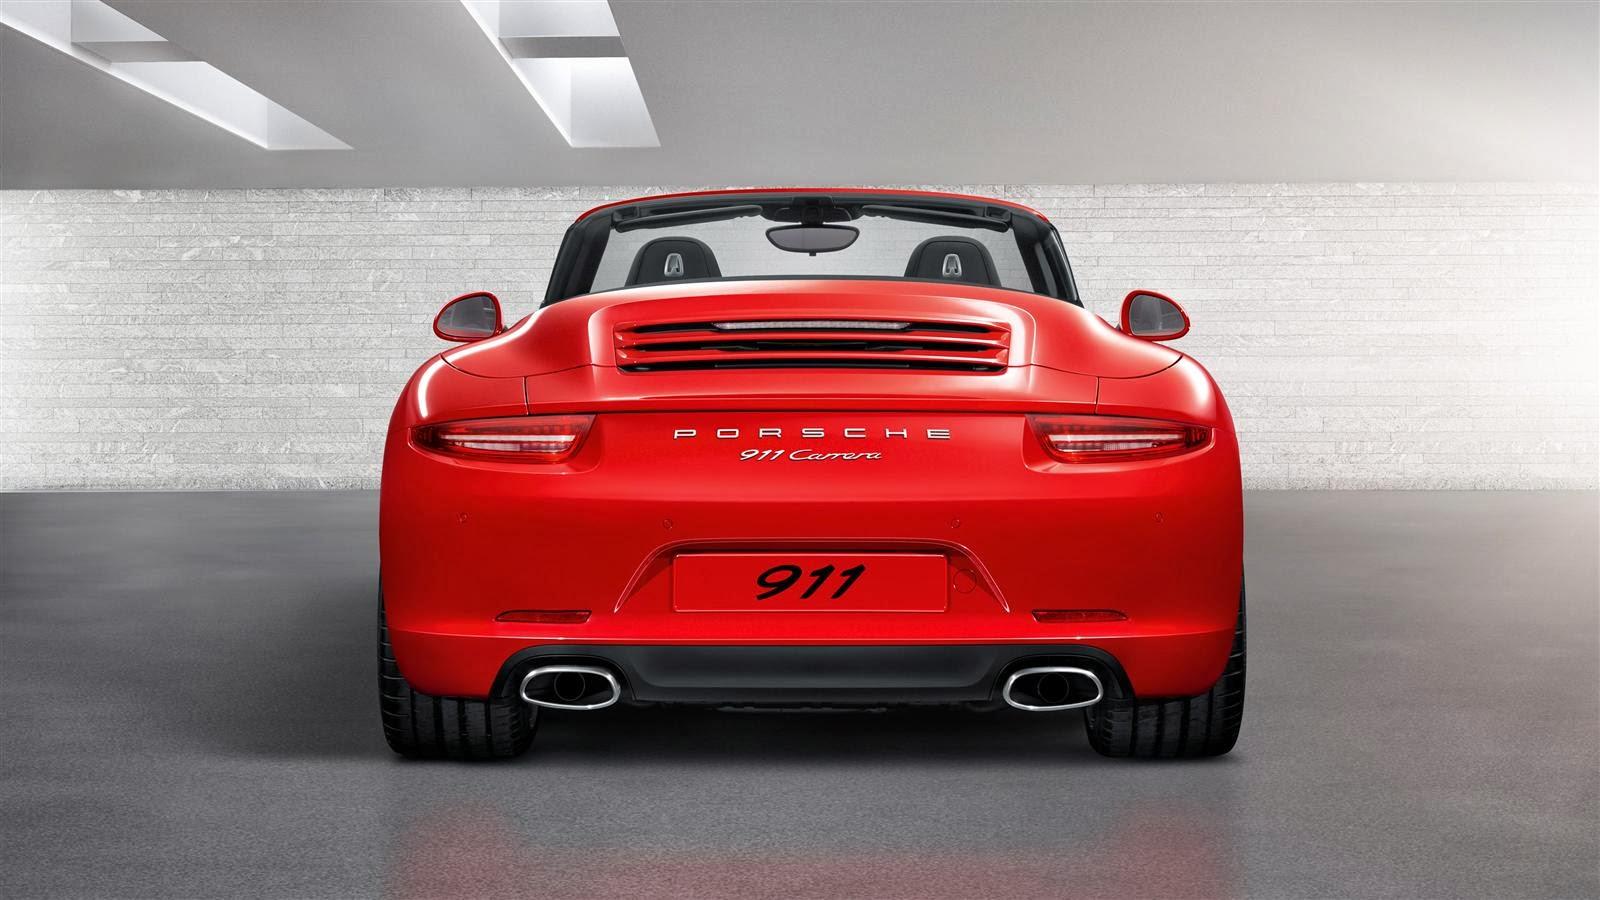 Porsche 911 Carrera Cabriolet Exterior2